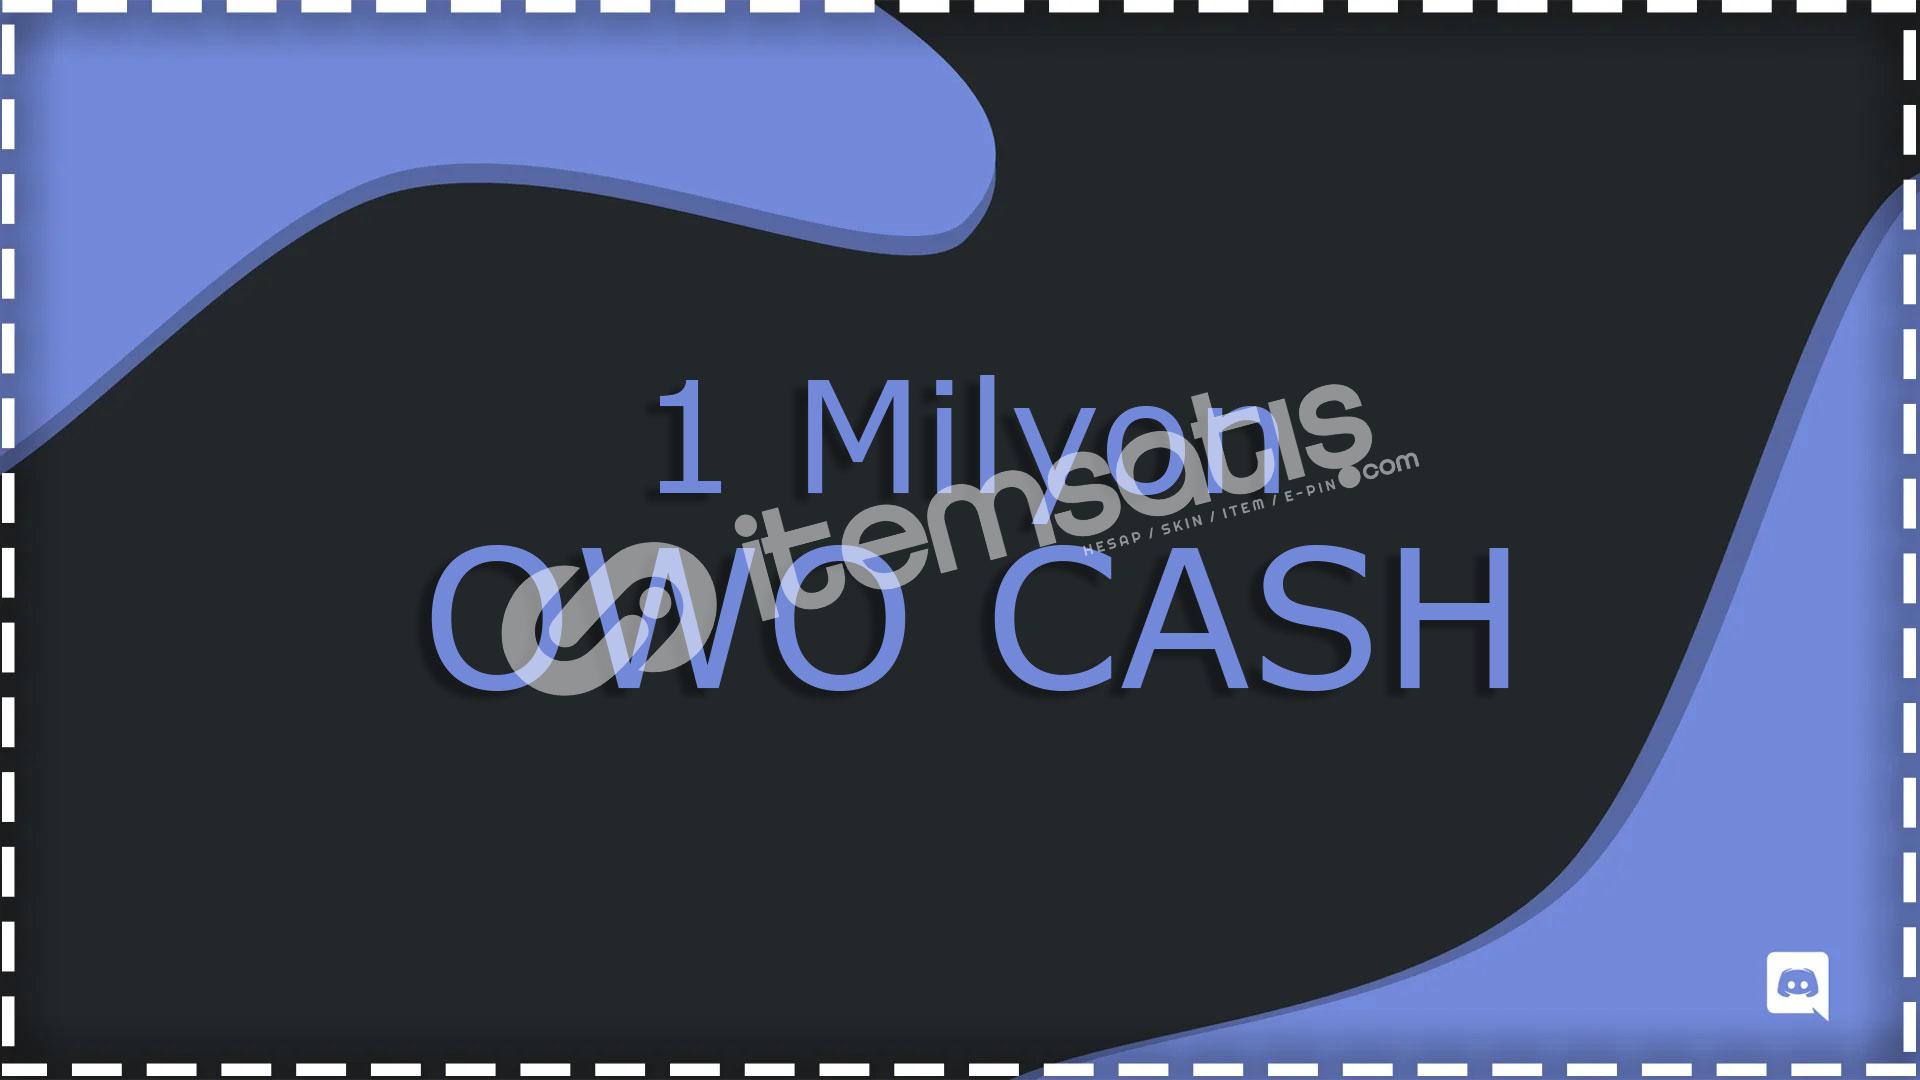 1M Owo Cash 11TL